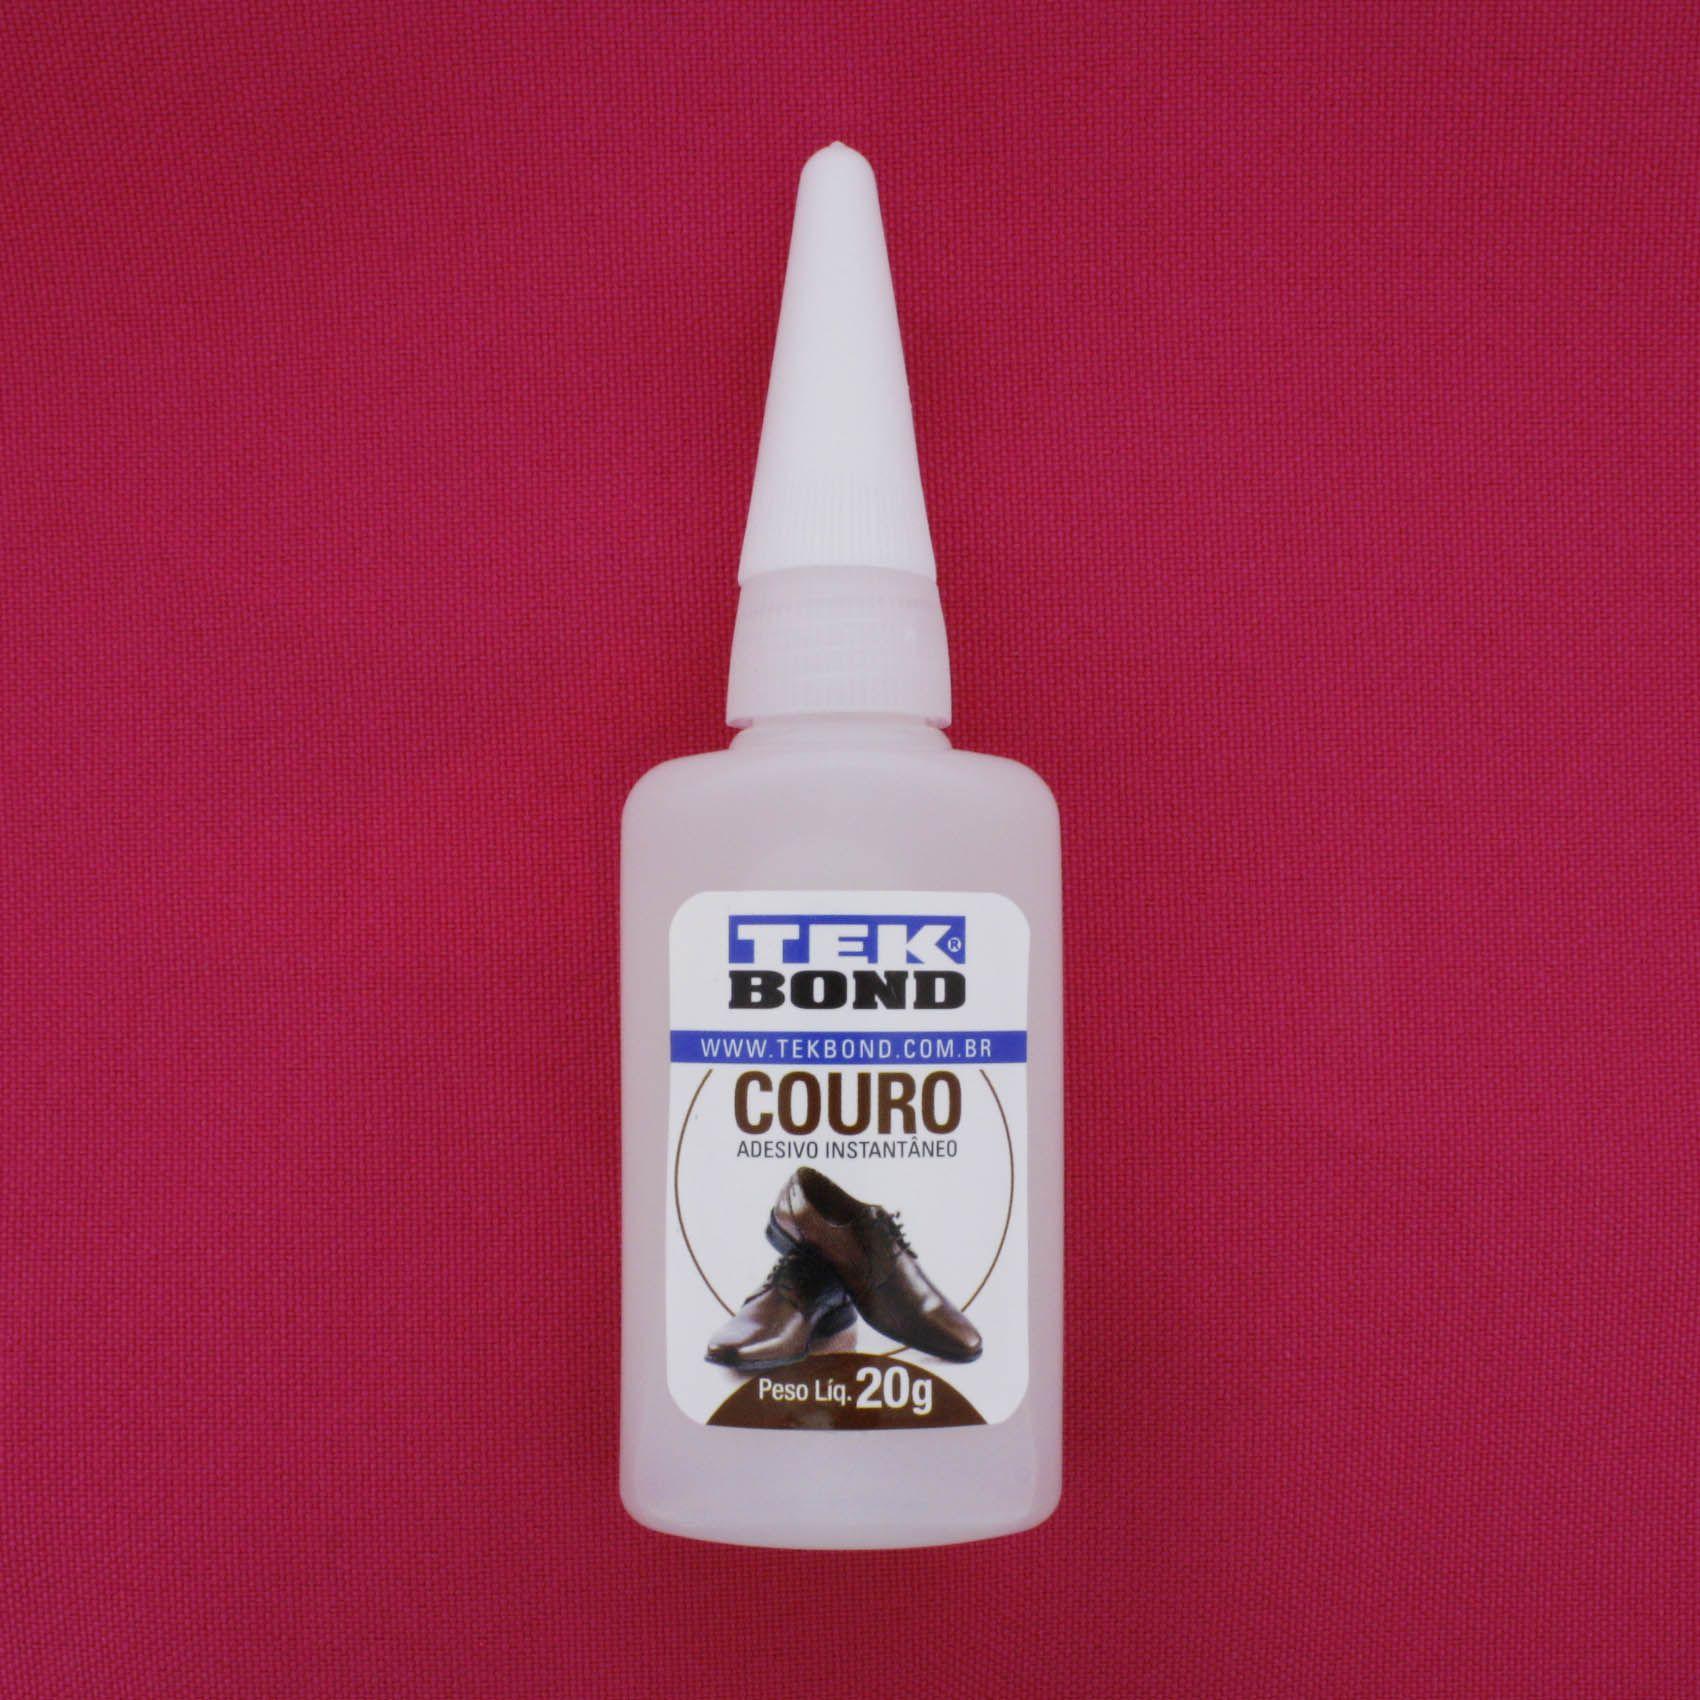 TekBond® Couro - Adesivo Instantâneo - 20g   - Stéphanie Bijoux® - Peças para Bijuterias e Artesanato